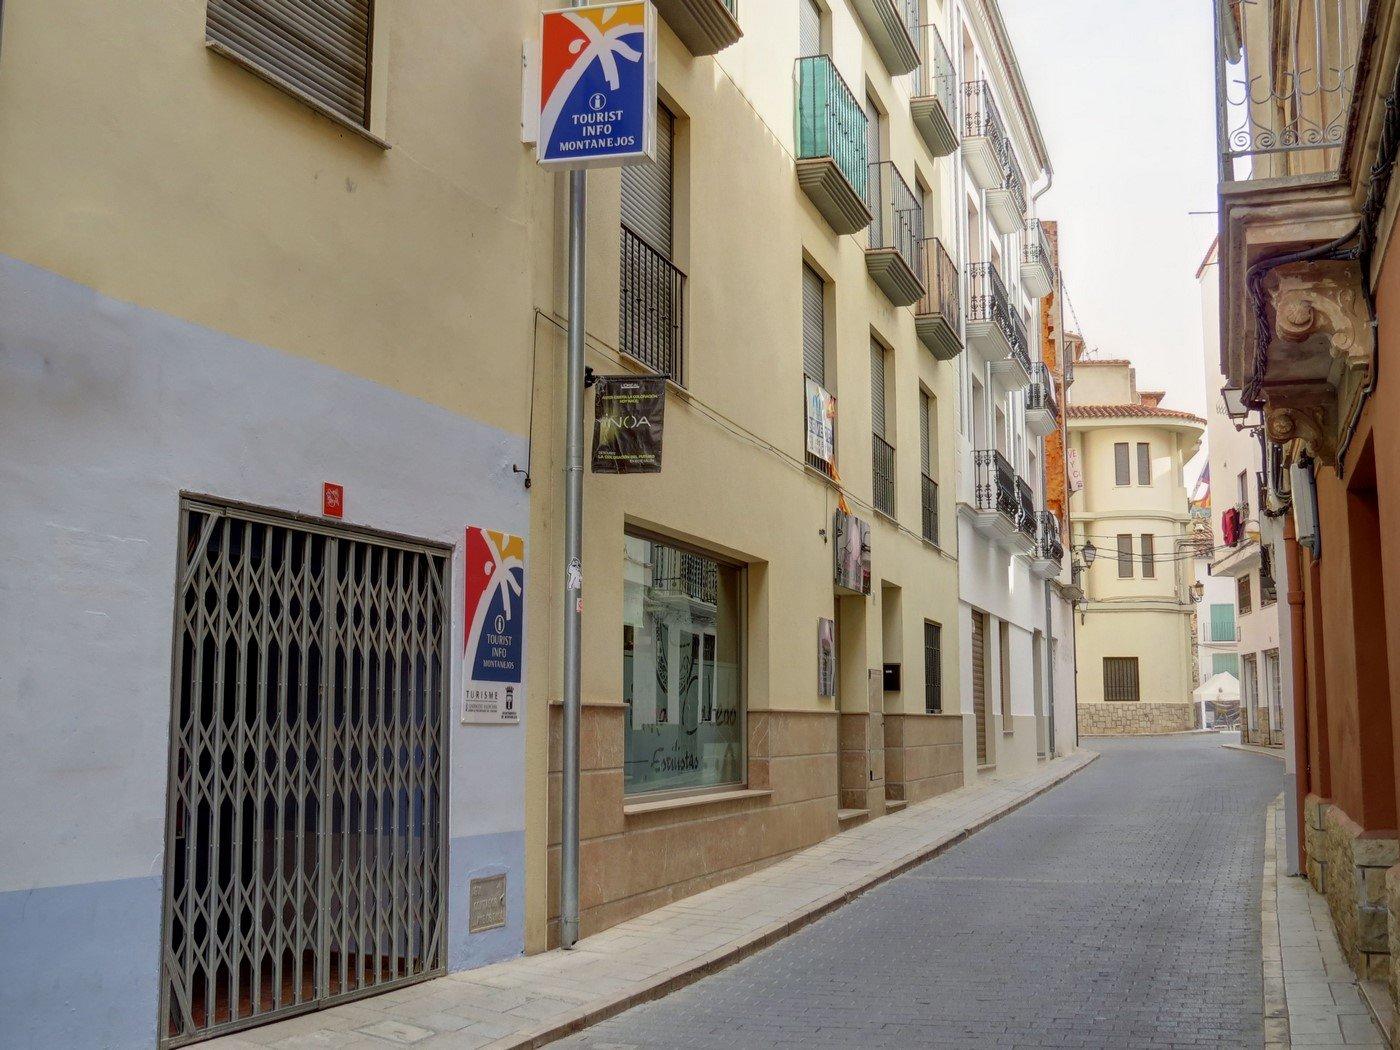 Oficina de turismo montanejos for Oficina turismo castellon